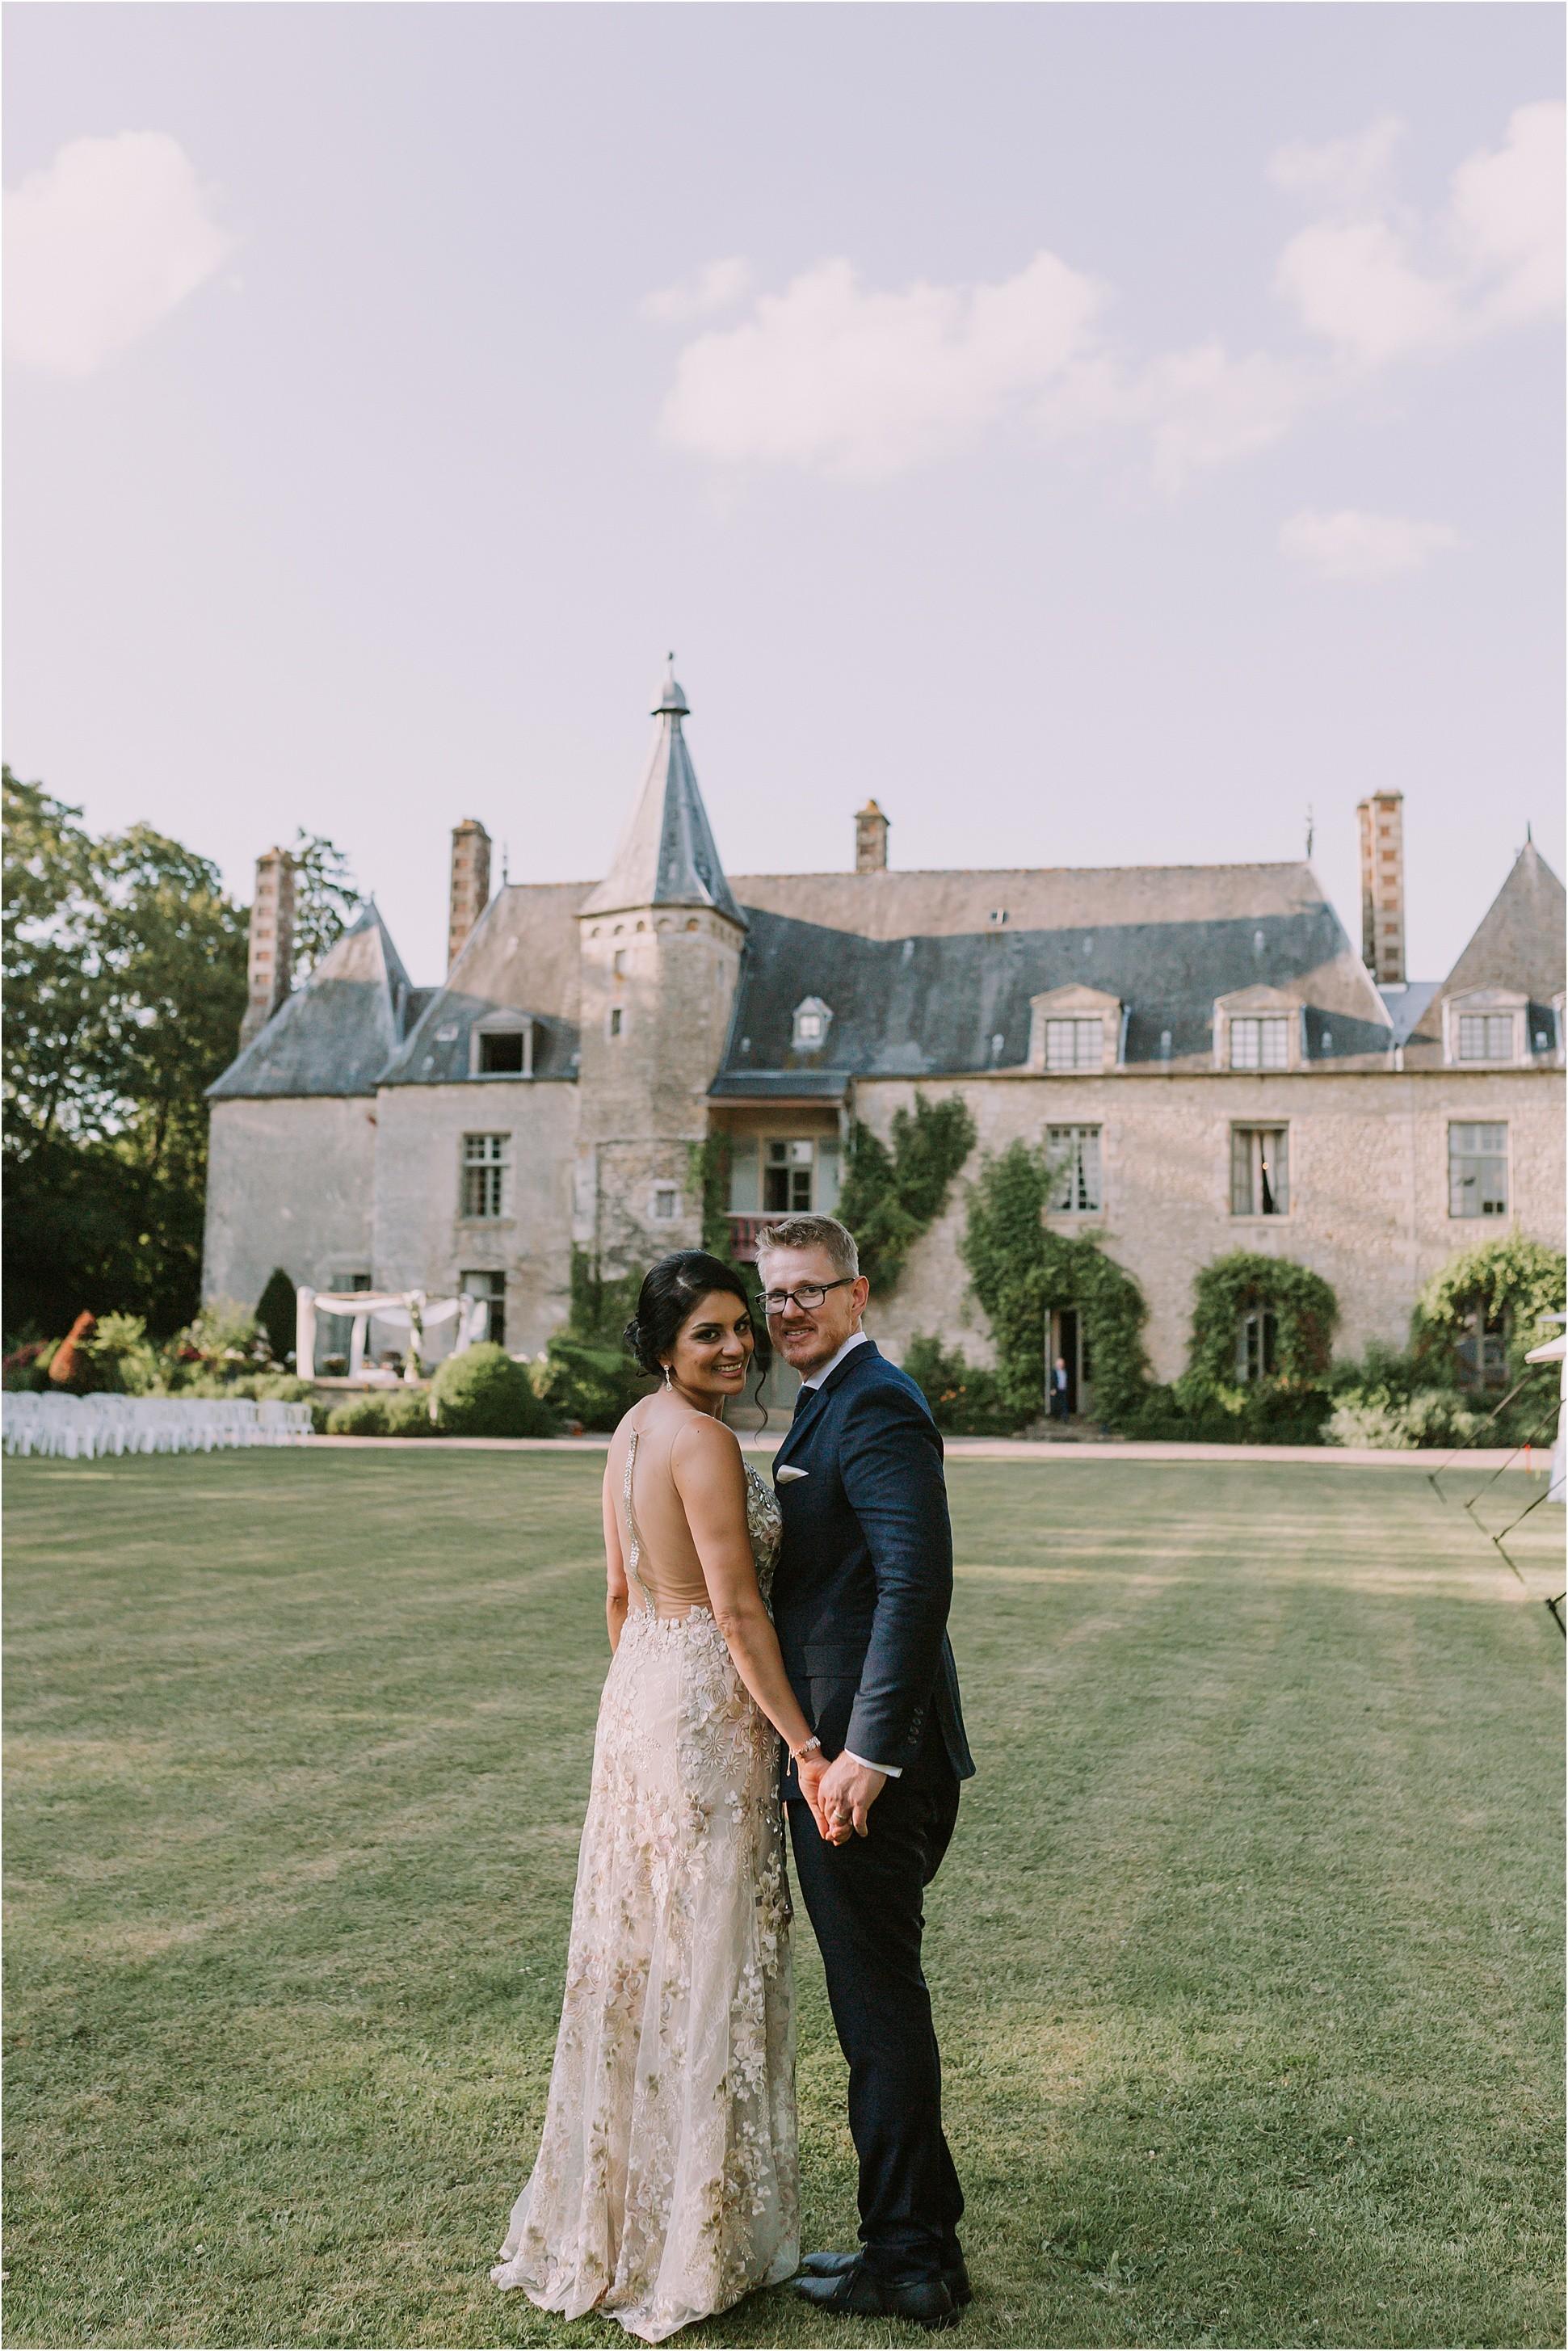 Kateryna-photos-photographe-mariage-chateau-st-paterne-mayenne-normandie_0178.jpg